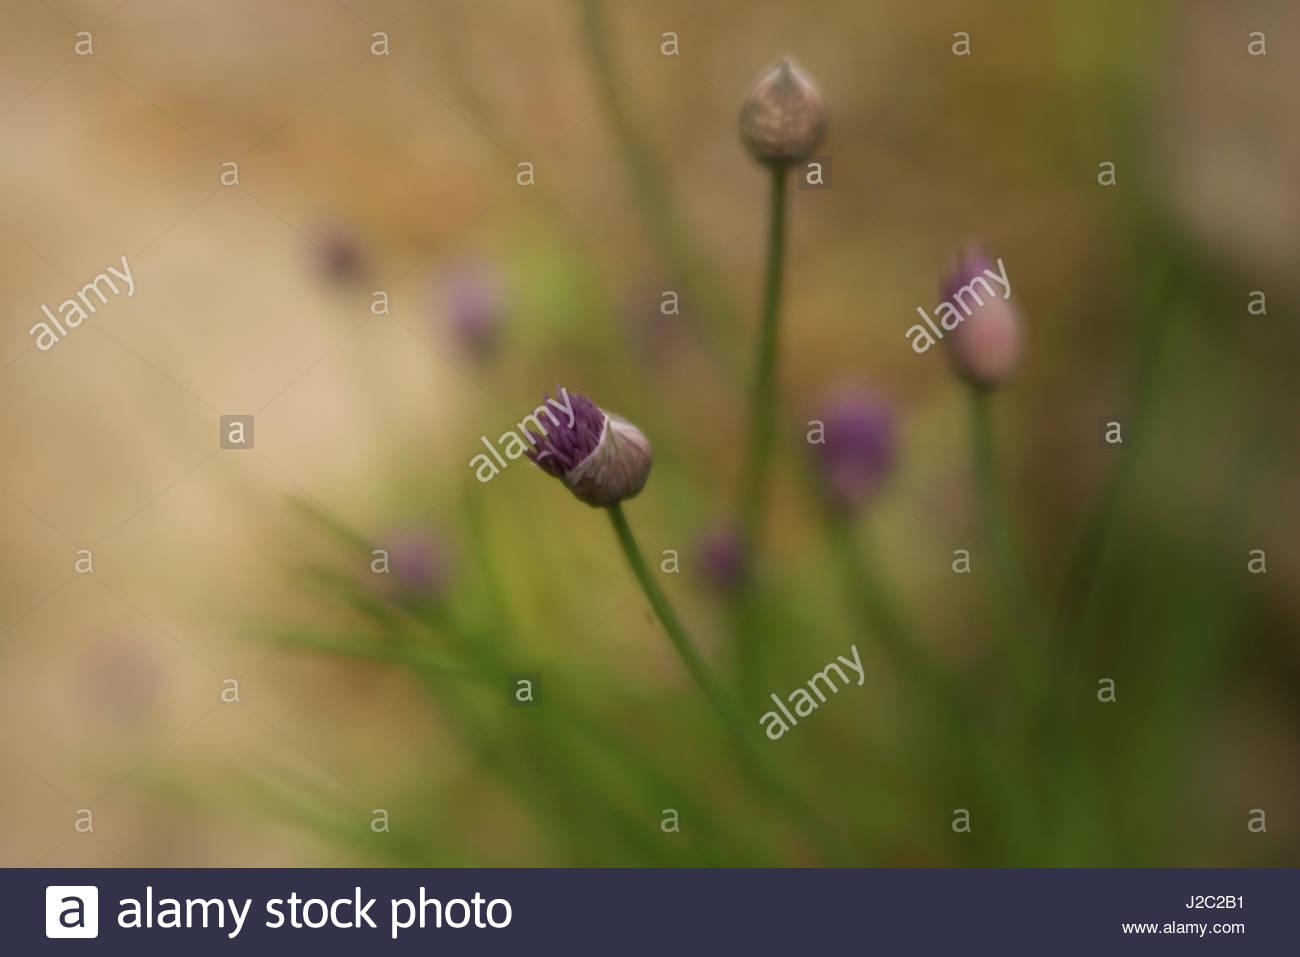 bursting chive - Stock Image